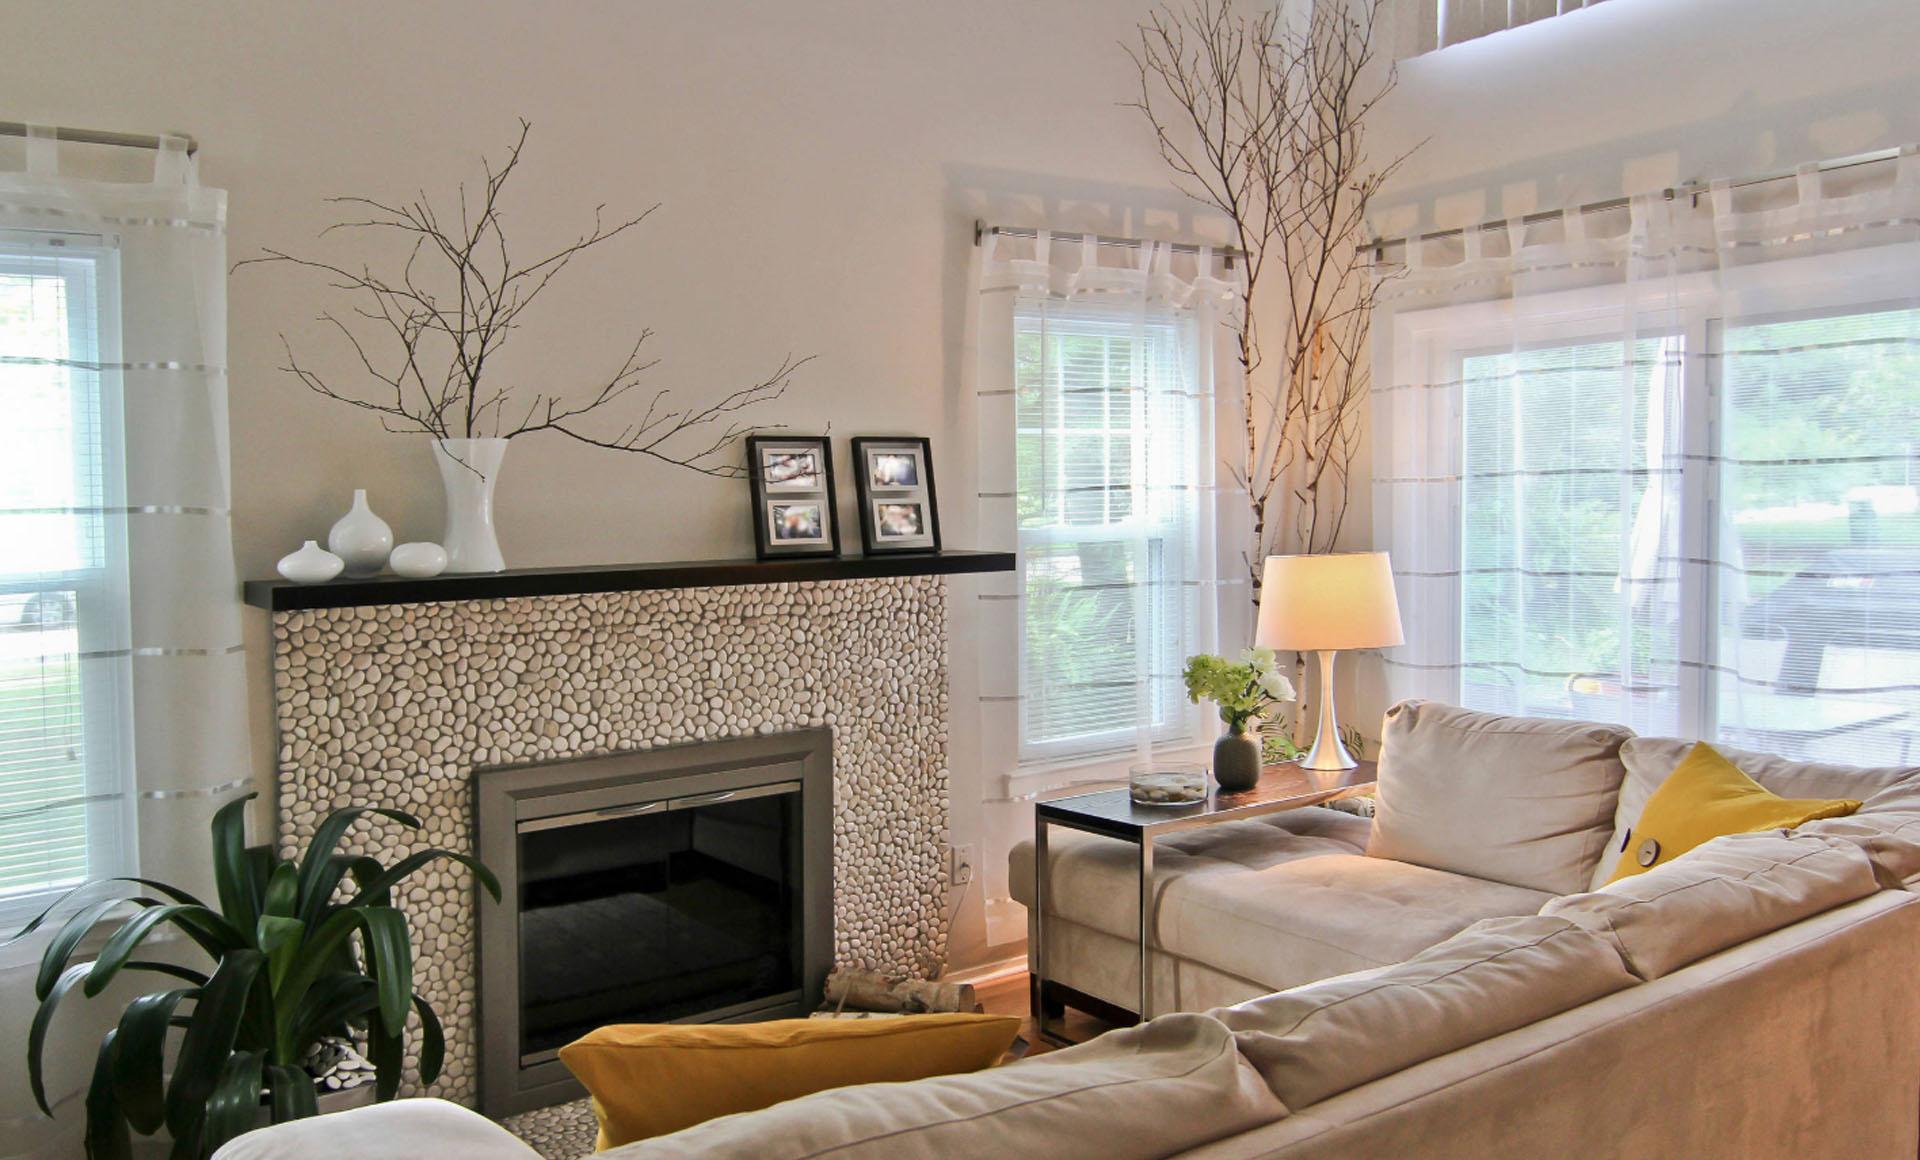 Pebble Pattern Fireplace Ideas